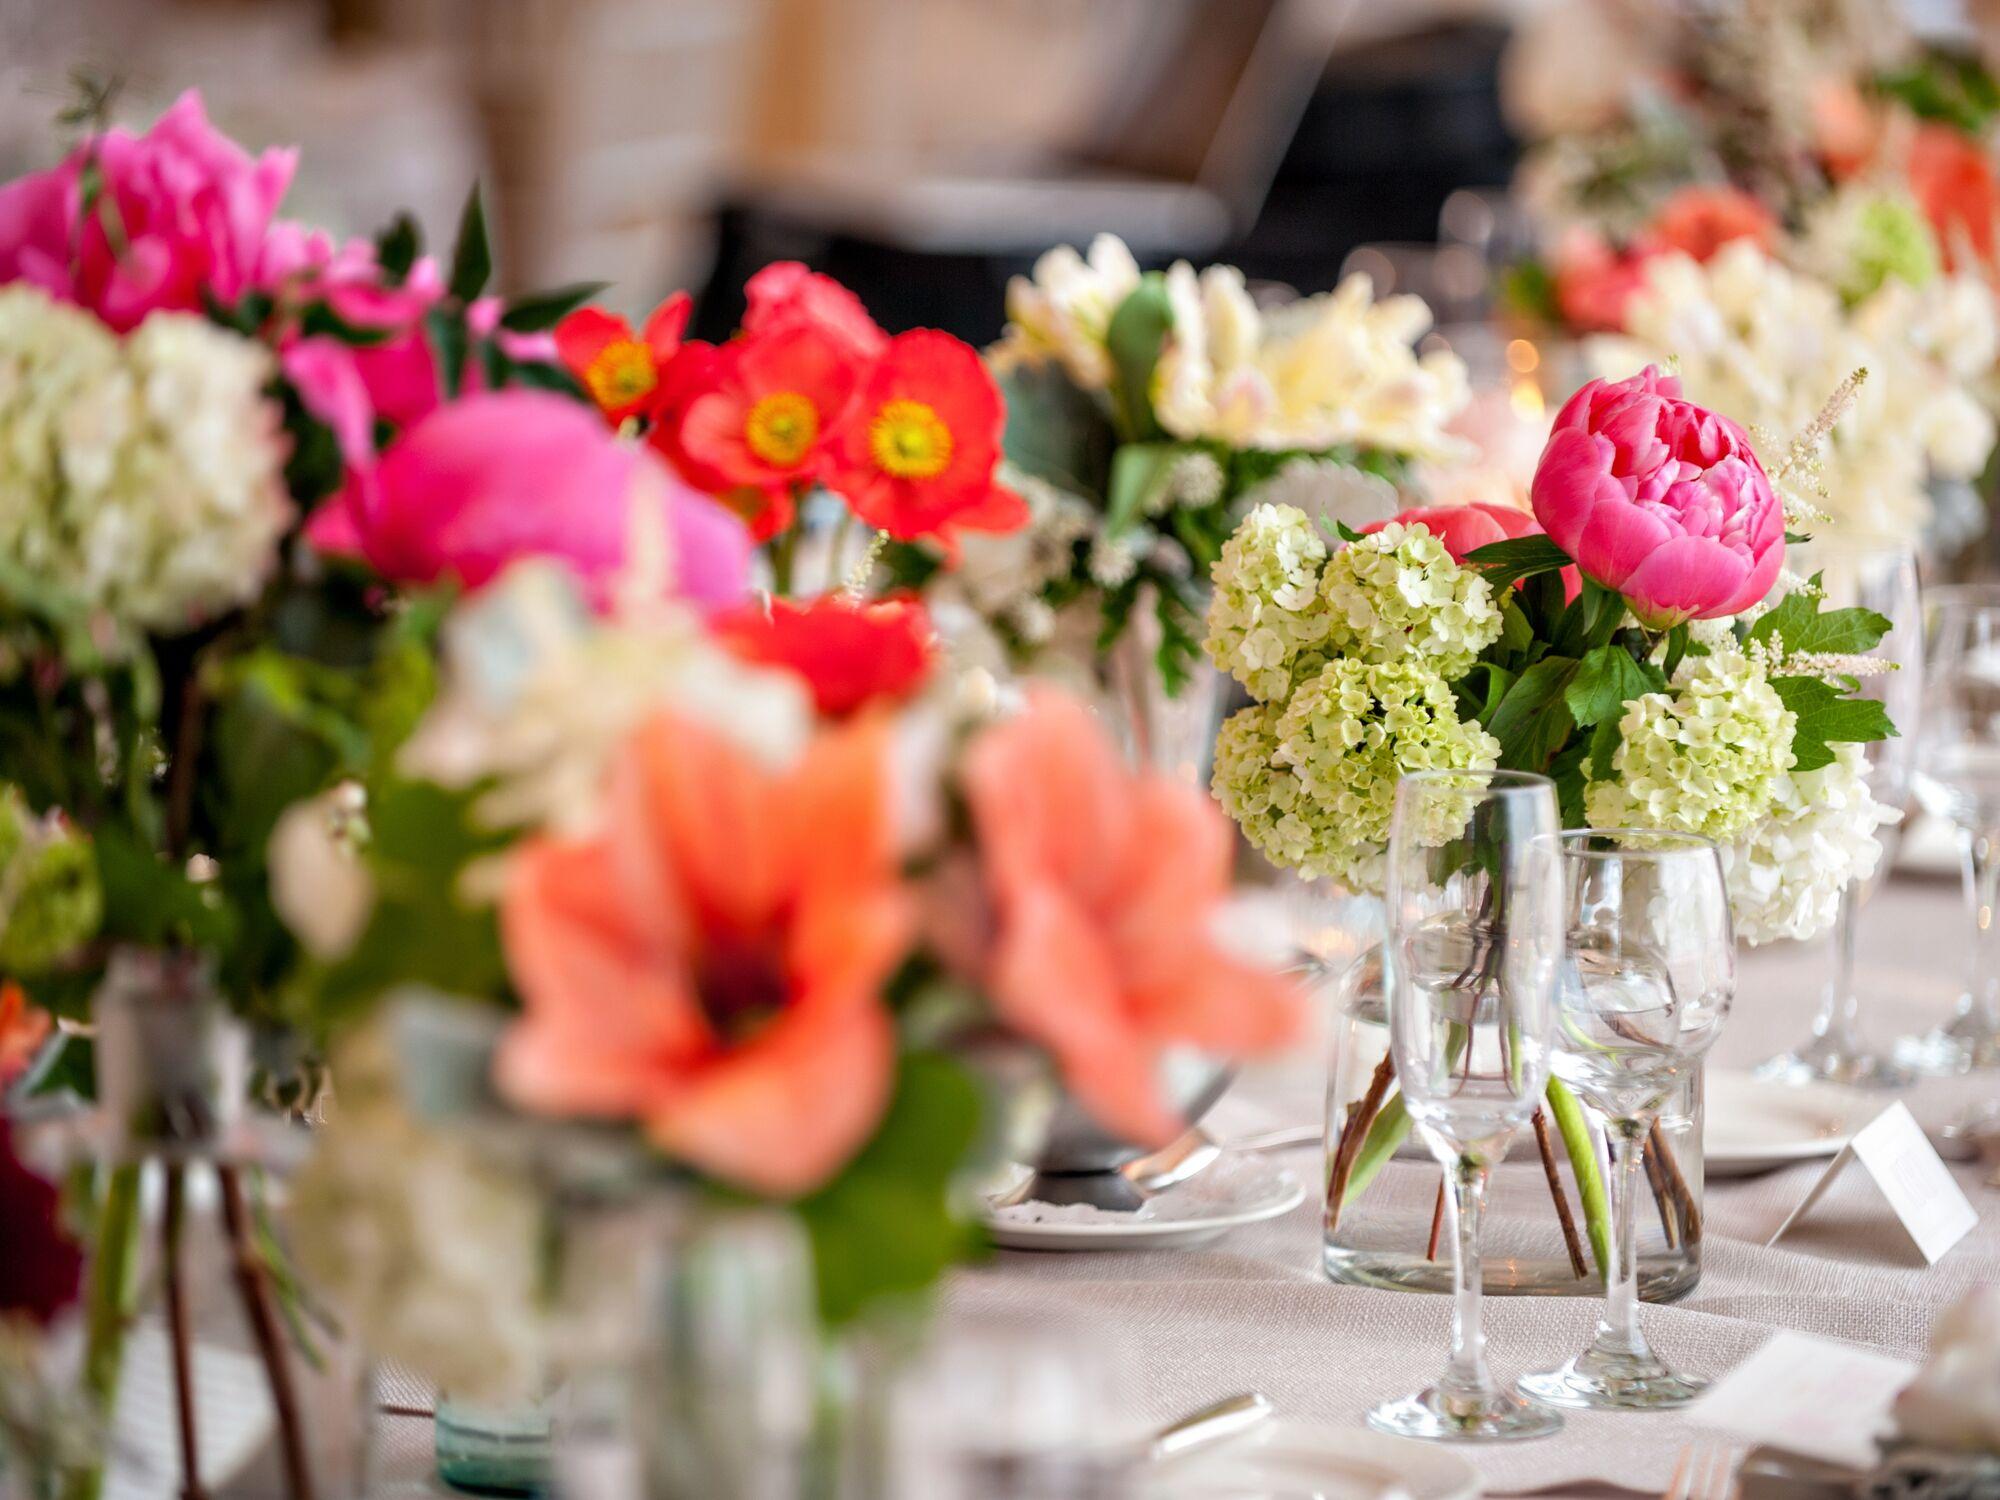 Wedding Flower Budget?